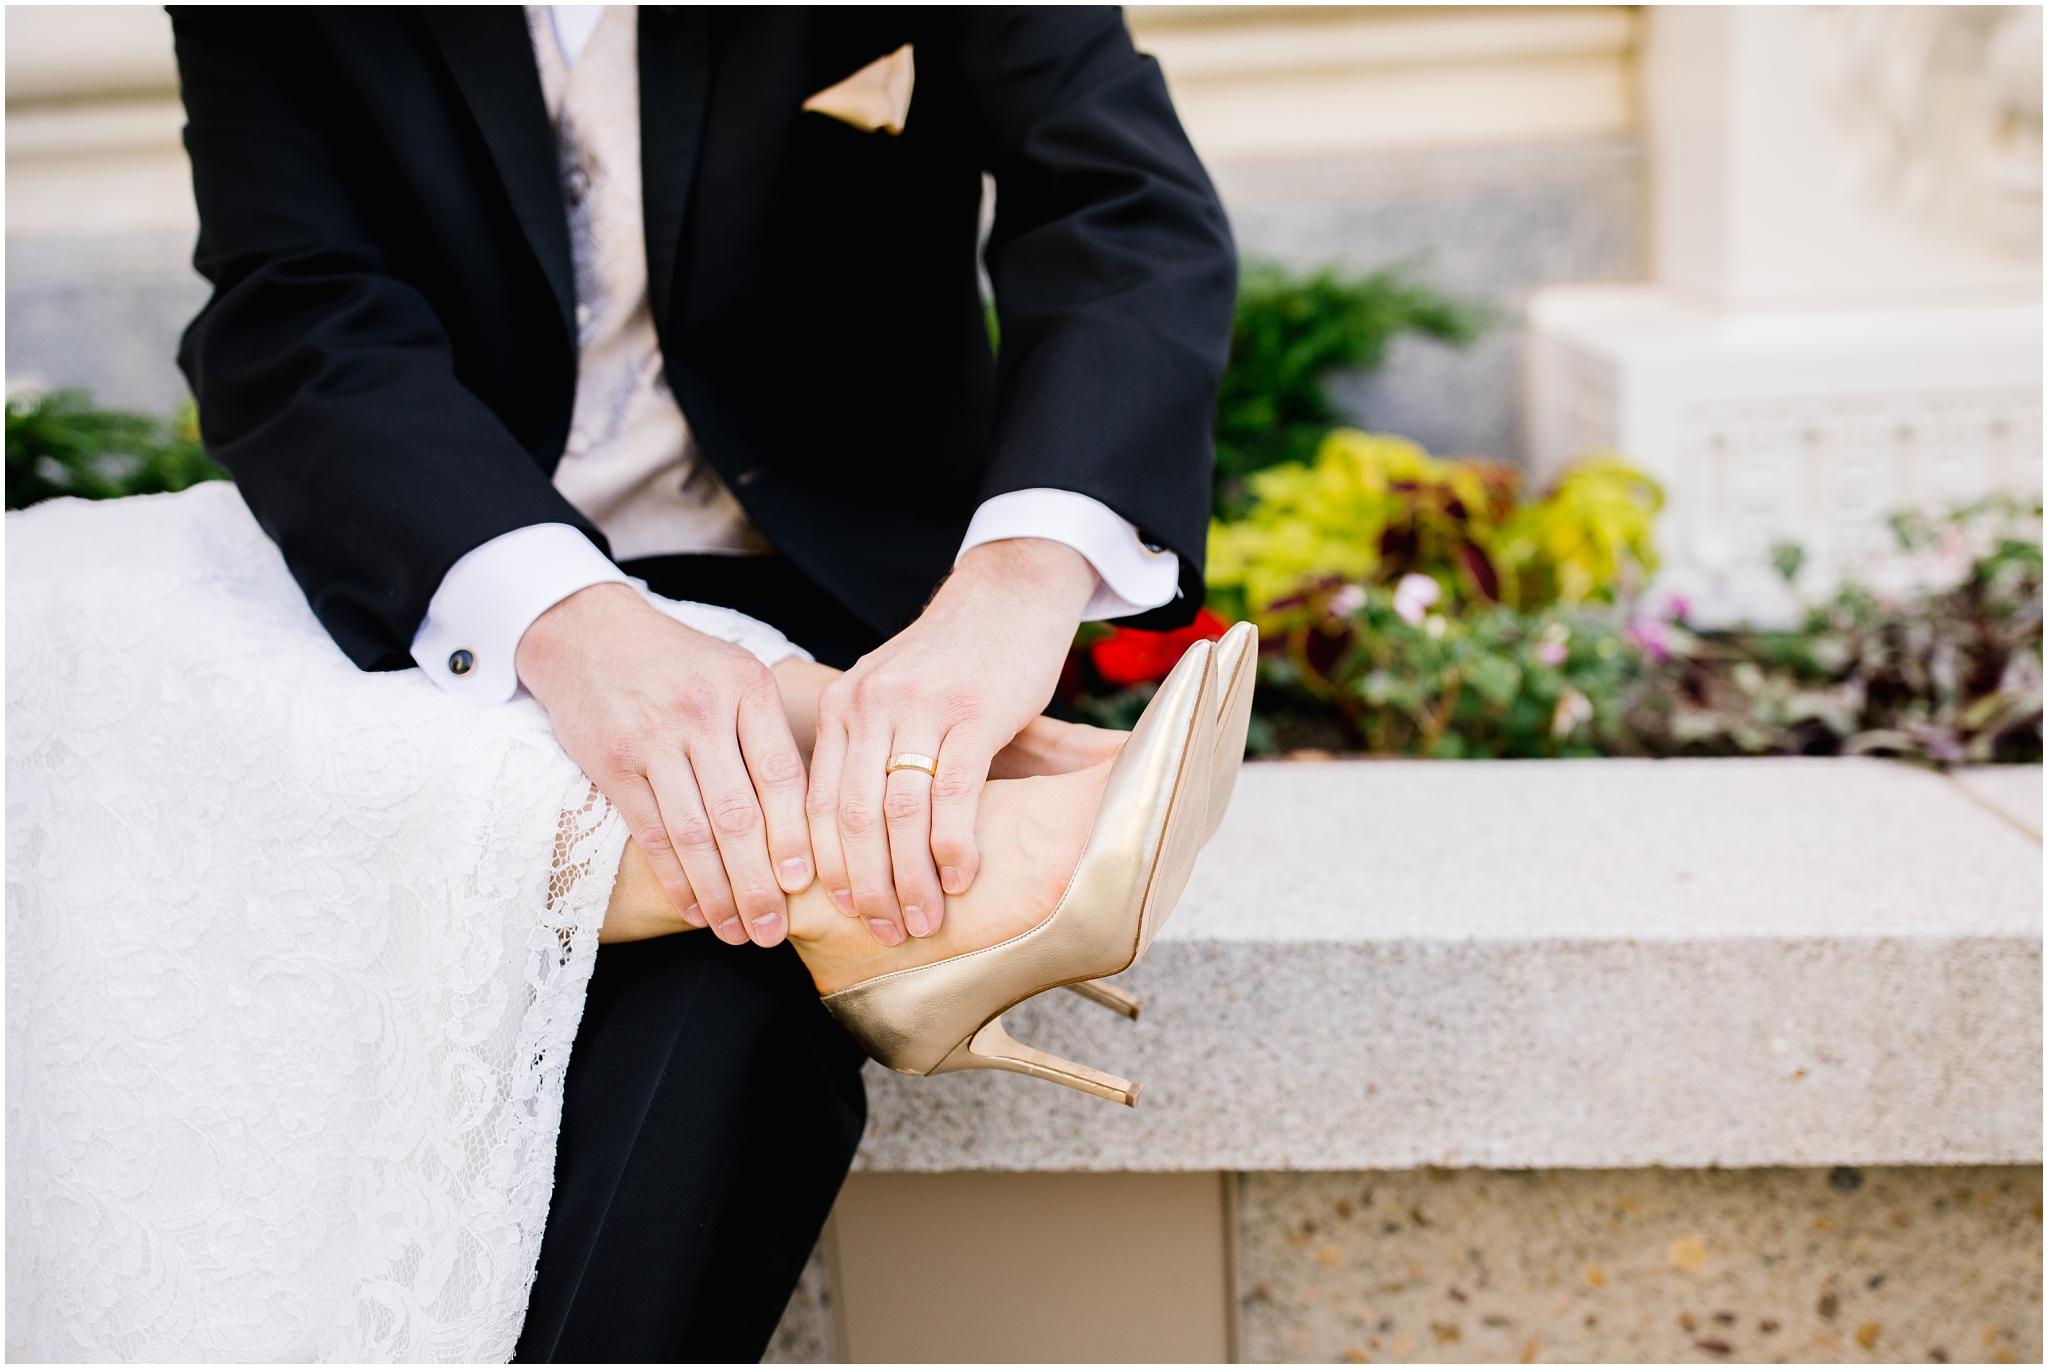 CherylandTyler-273_Lizzie-B-Imagery-Utah-Wedding-Photographer-Salt-Lake-City-Temple-Wells-Fargo-Building-Reception.jpg